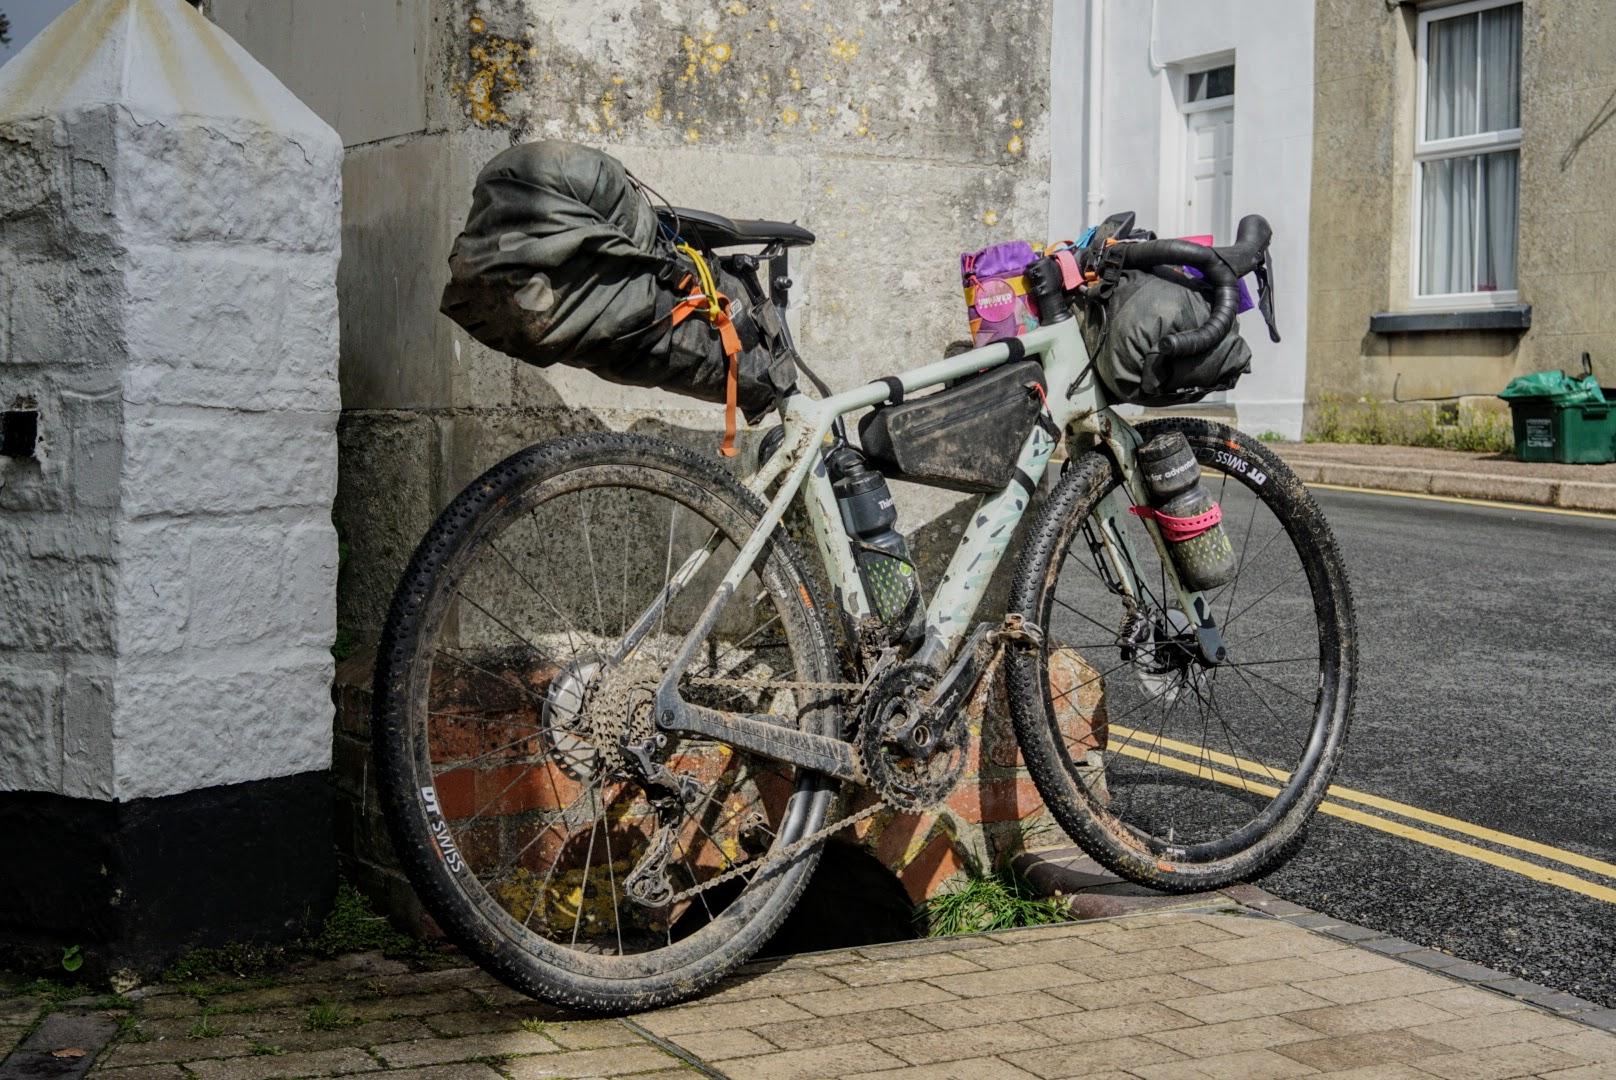 Canyon Grizl bikepacking bags